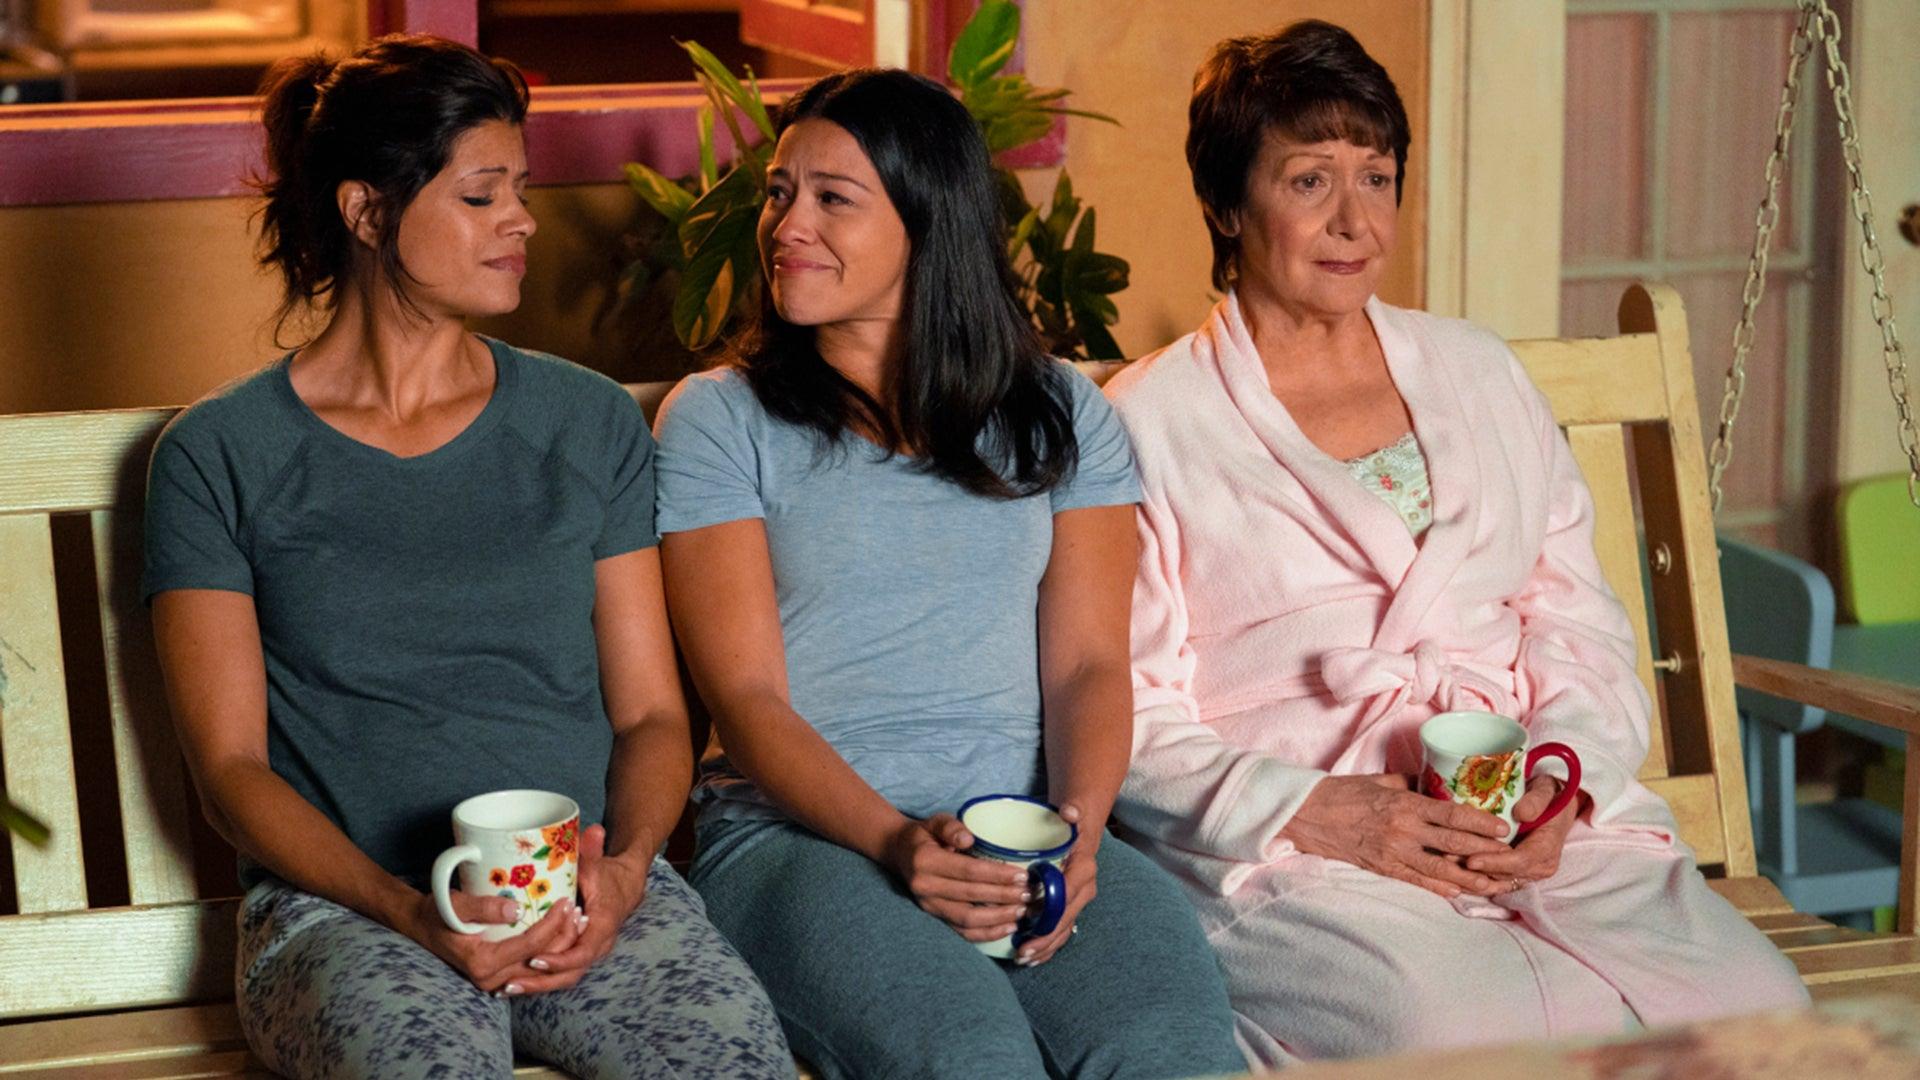 Andrea Navedo, Gina Rodriguez, Ivonne Coll, Jane the Virgin